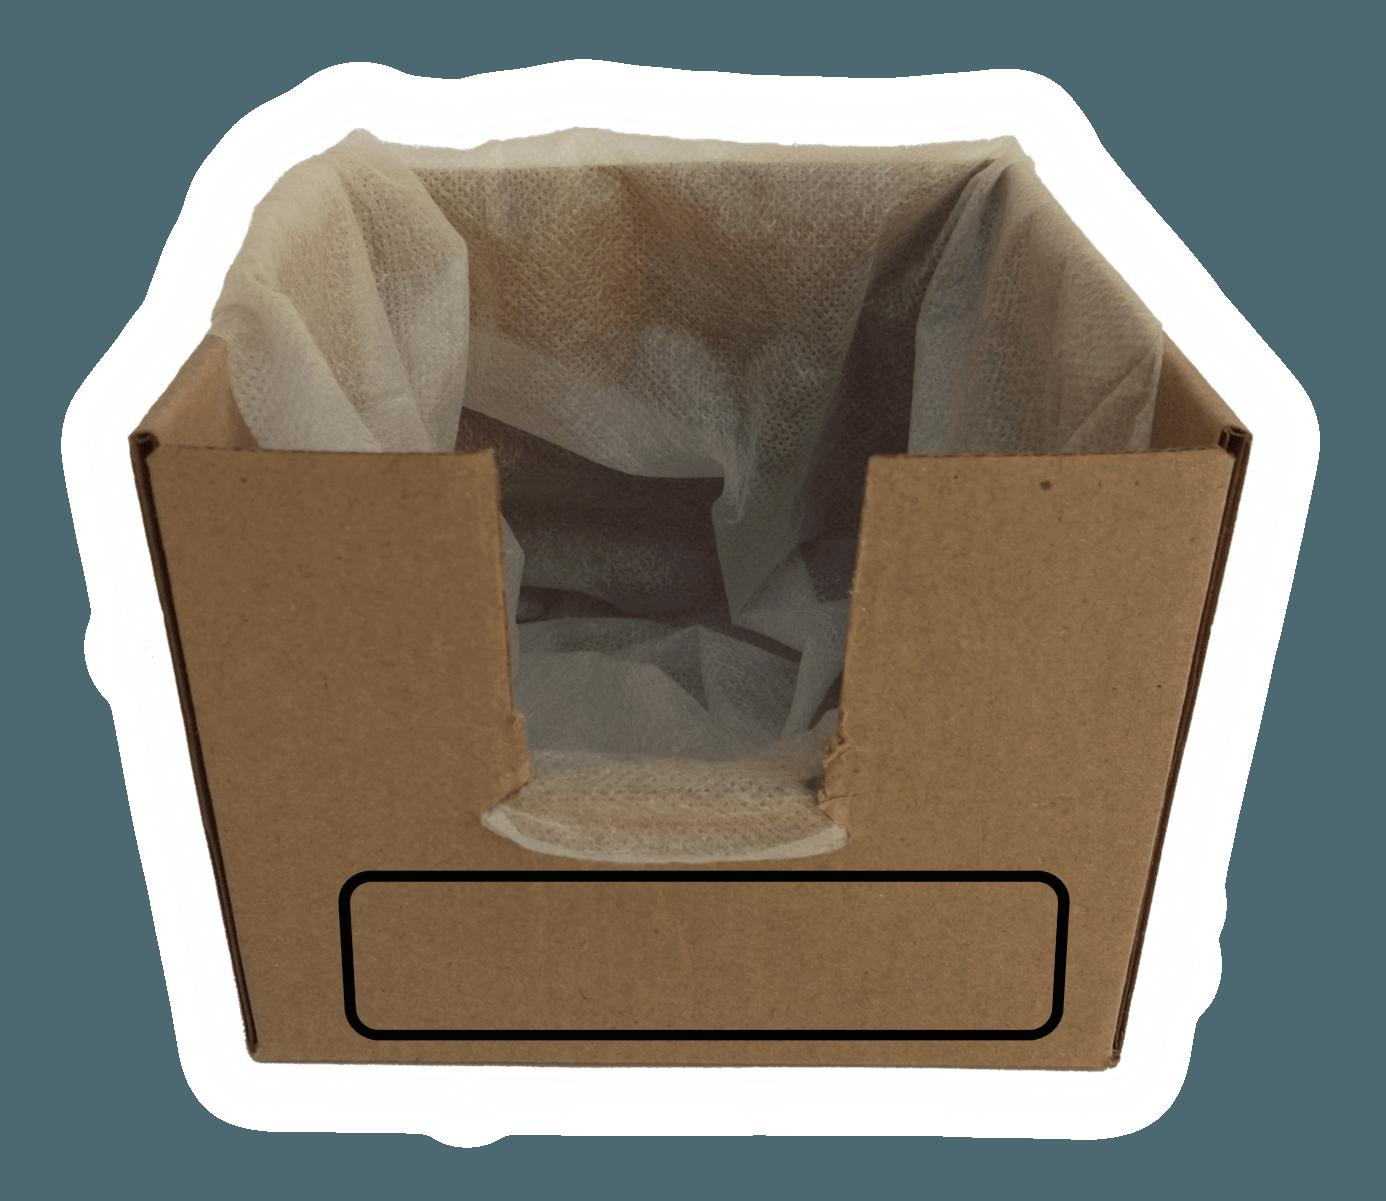 box recycling machine